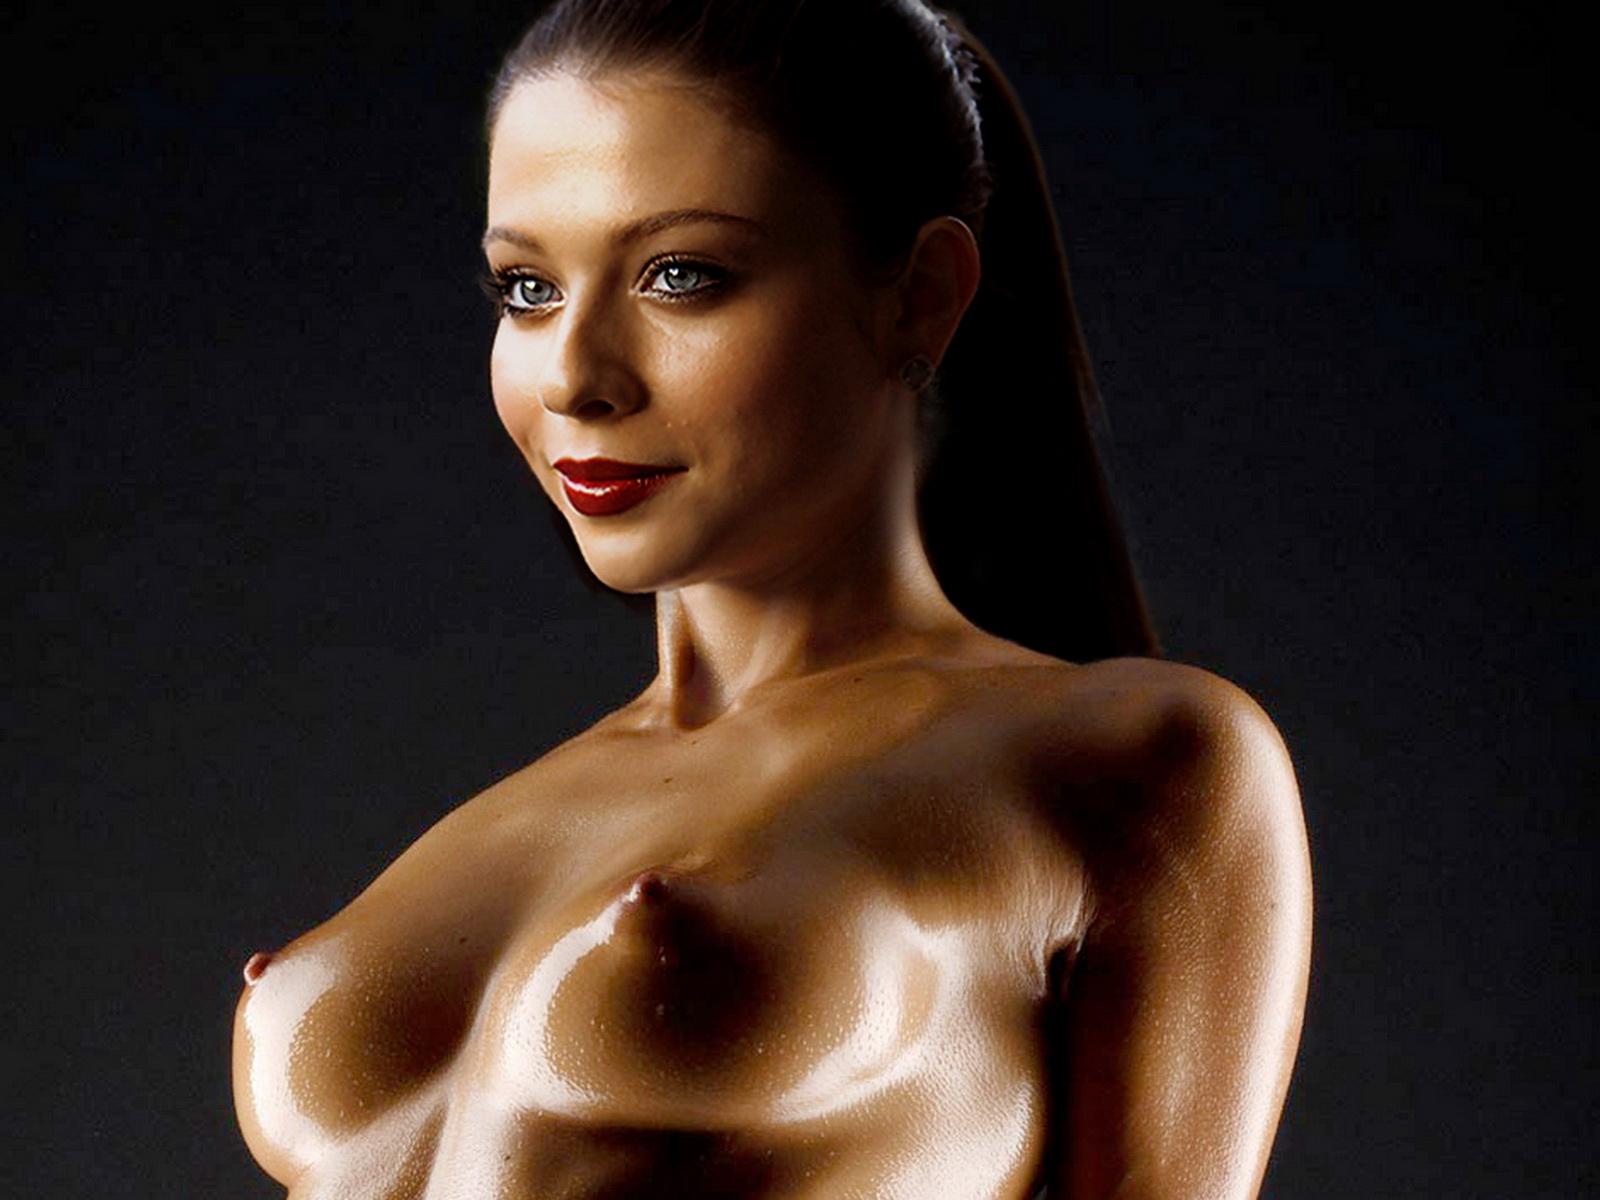 Porn galleries michelle trachtenberg completely nude video